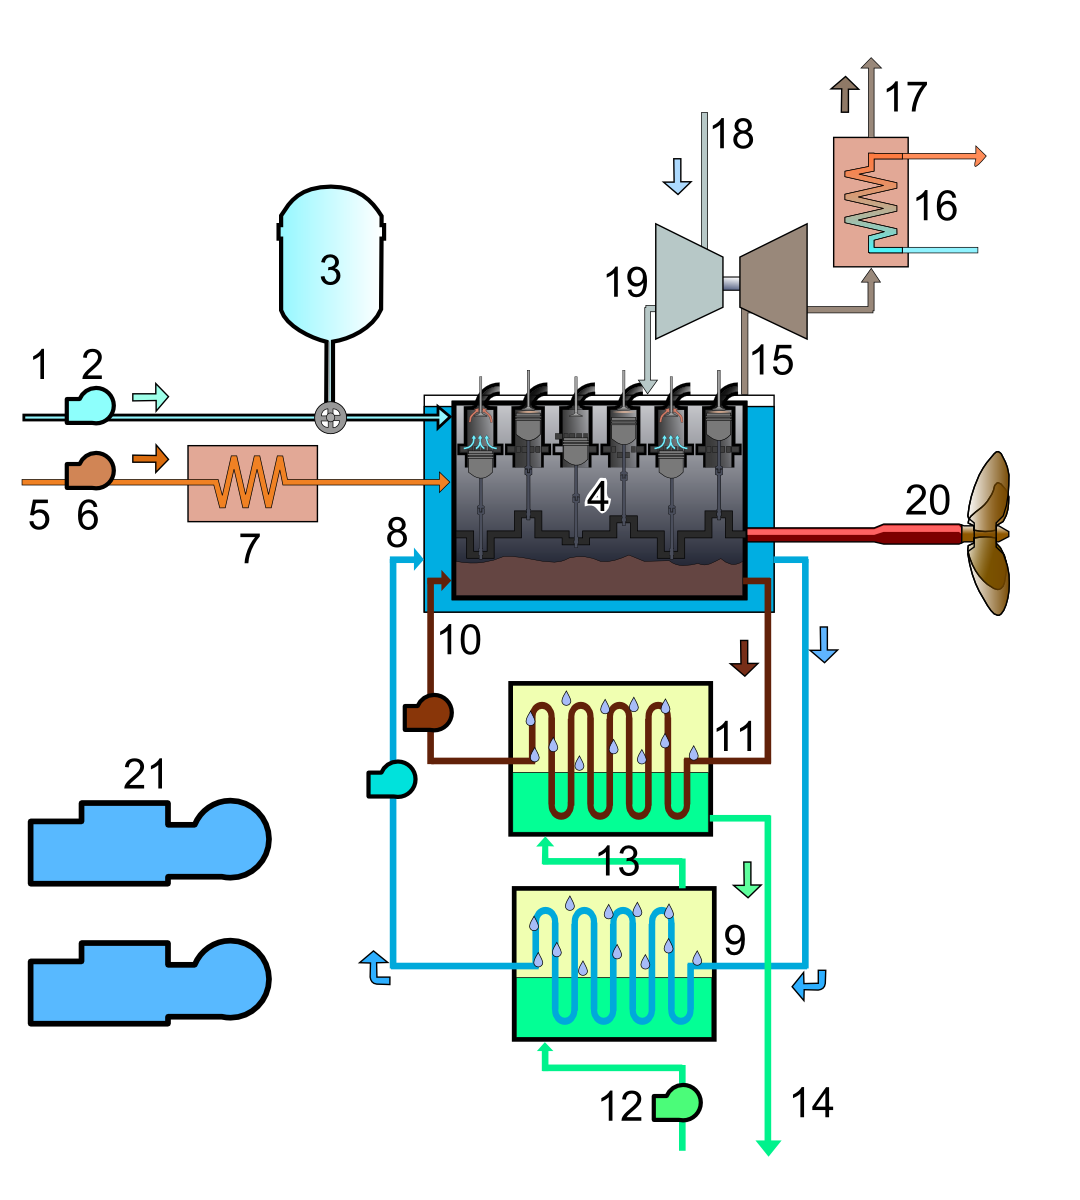 how search engines work diagram how automotive wiring diagrams ship s sel engine brockdiagram nt how search engines work diagram ship s sel engine brockdiagram nt